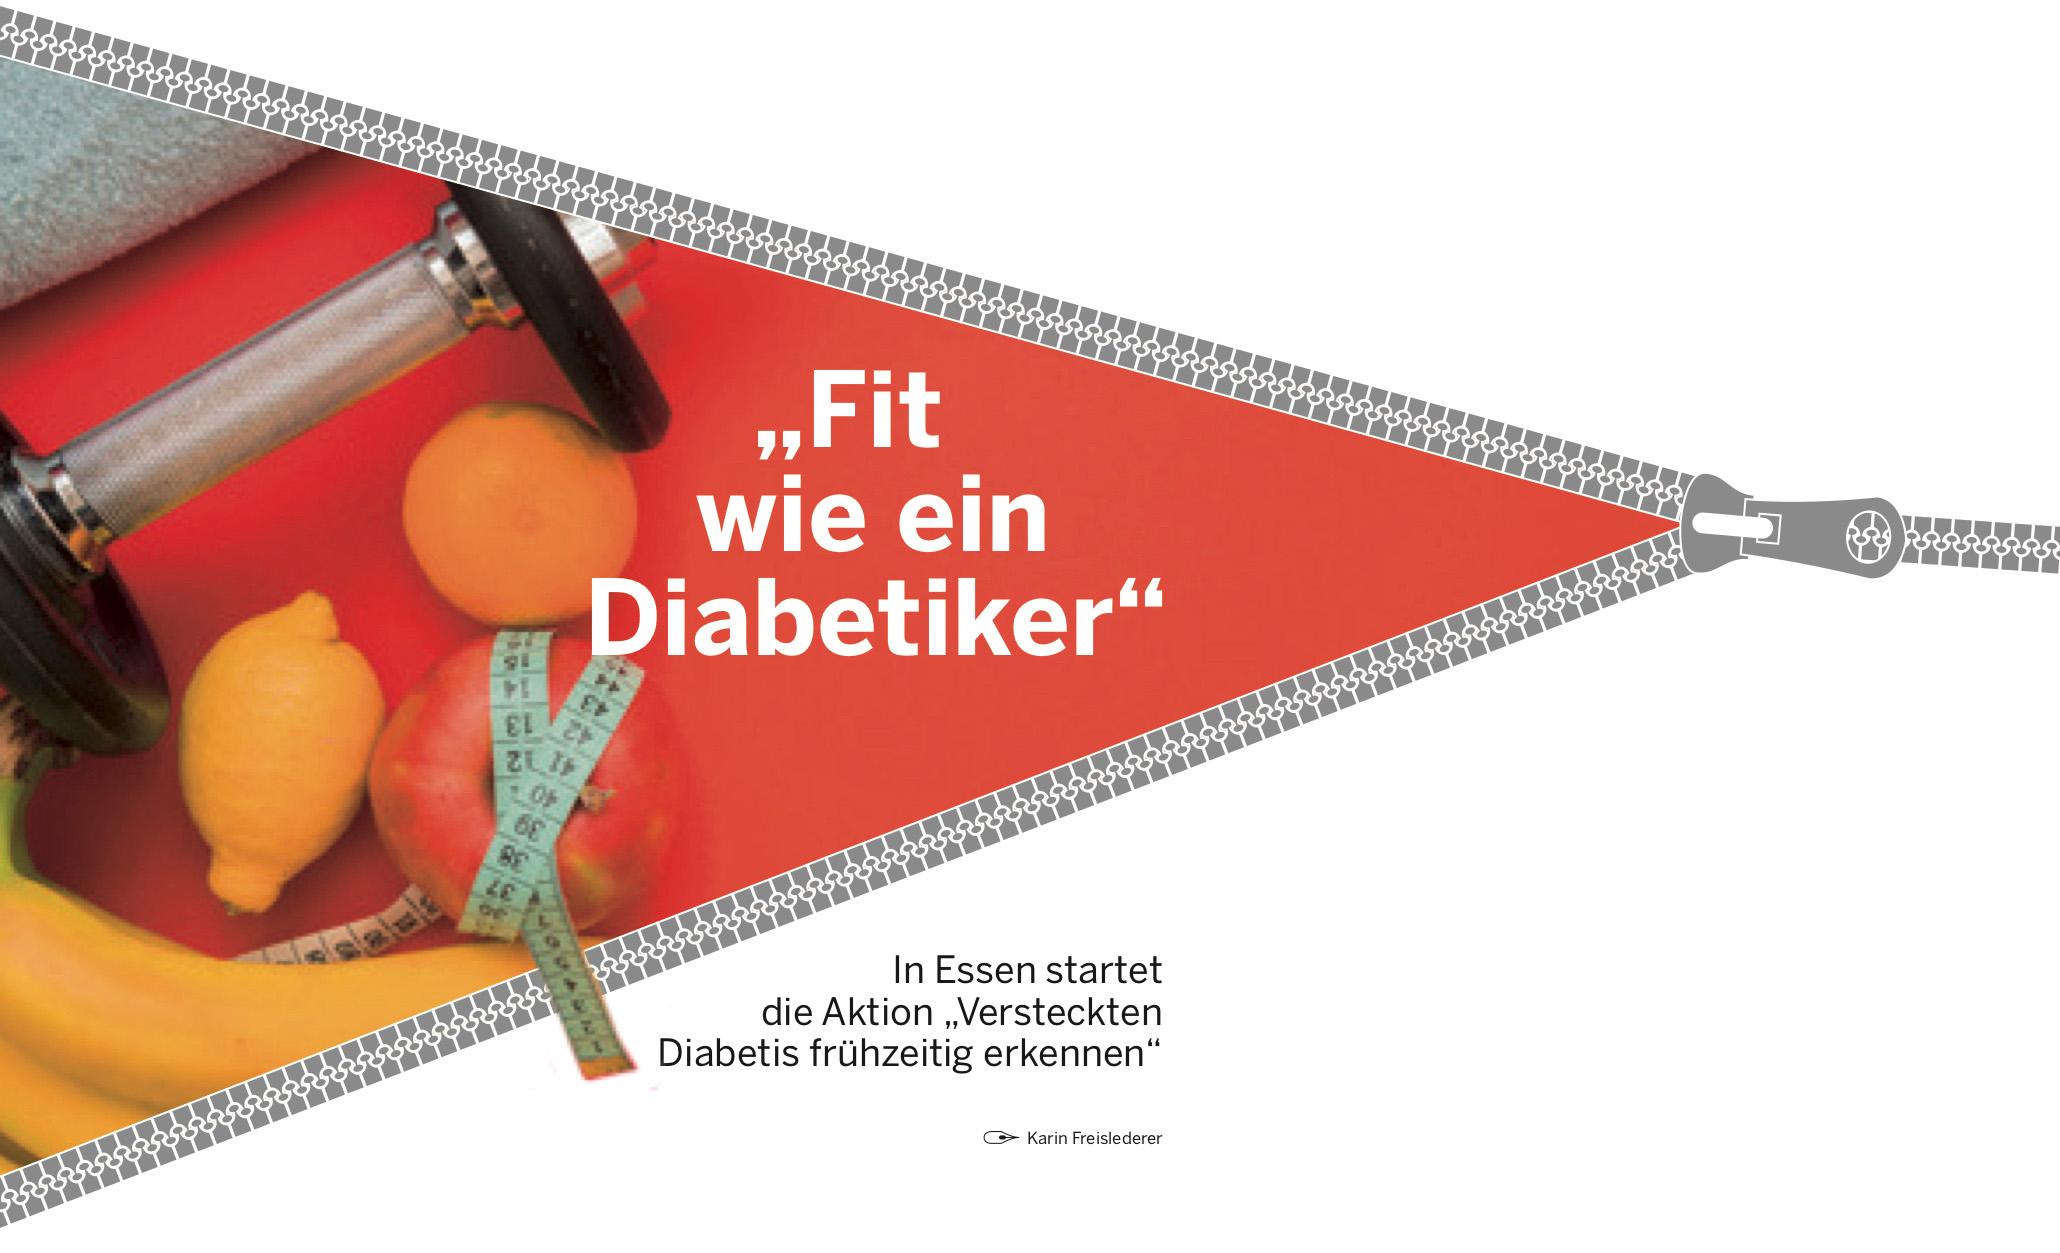 Fit wie ein Diabetiker